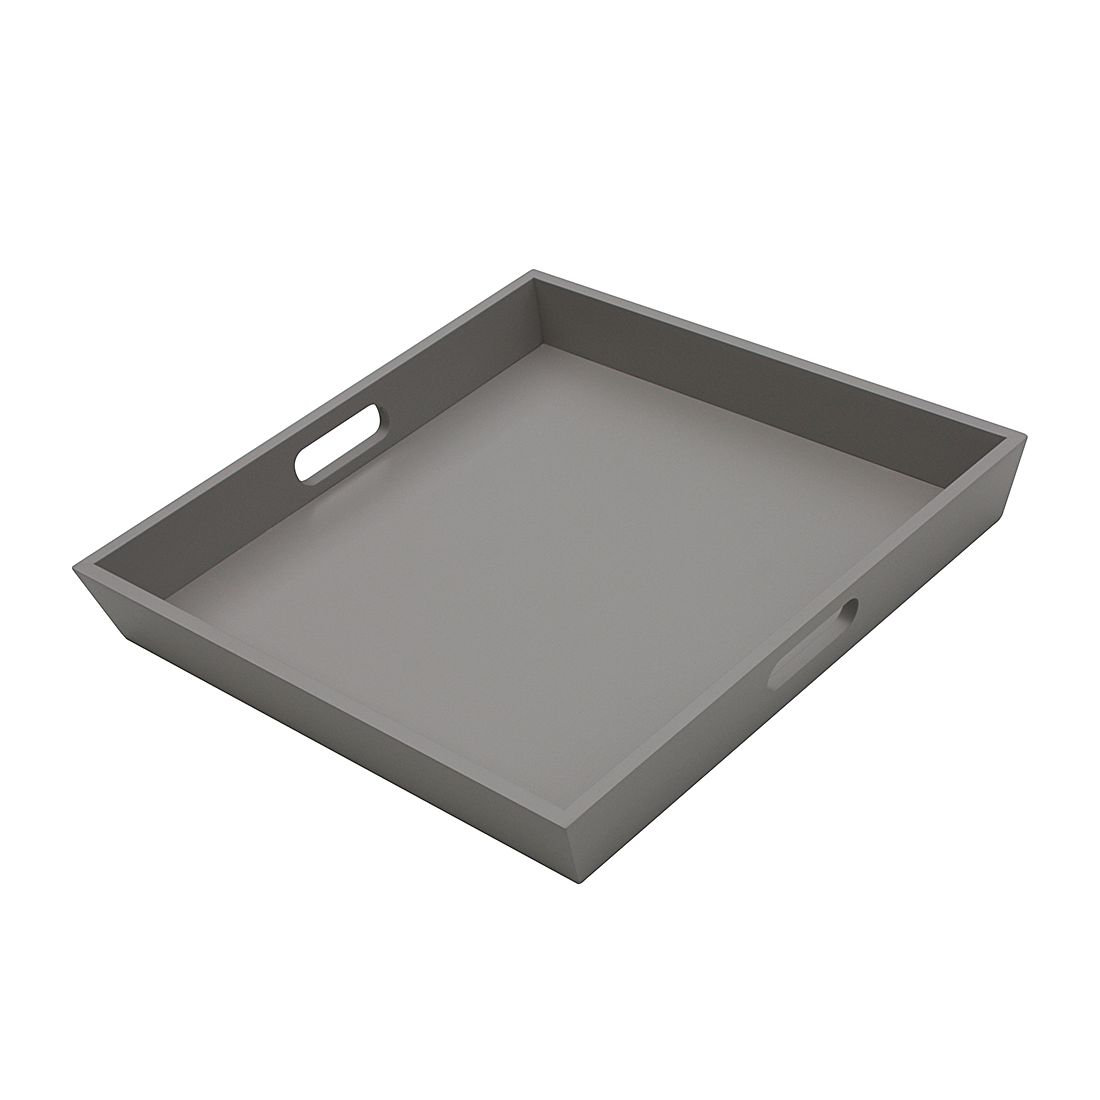 bett tablett ikea swalif. Black Bedroom Furniture Sets. Home Design Ideas